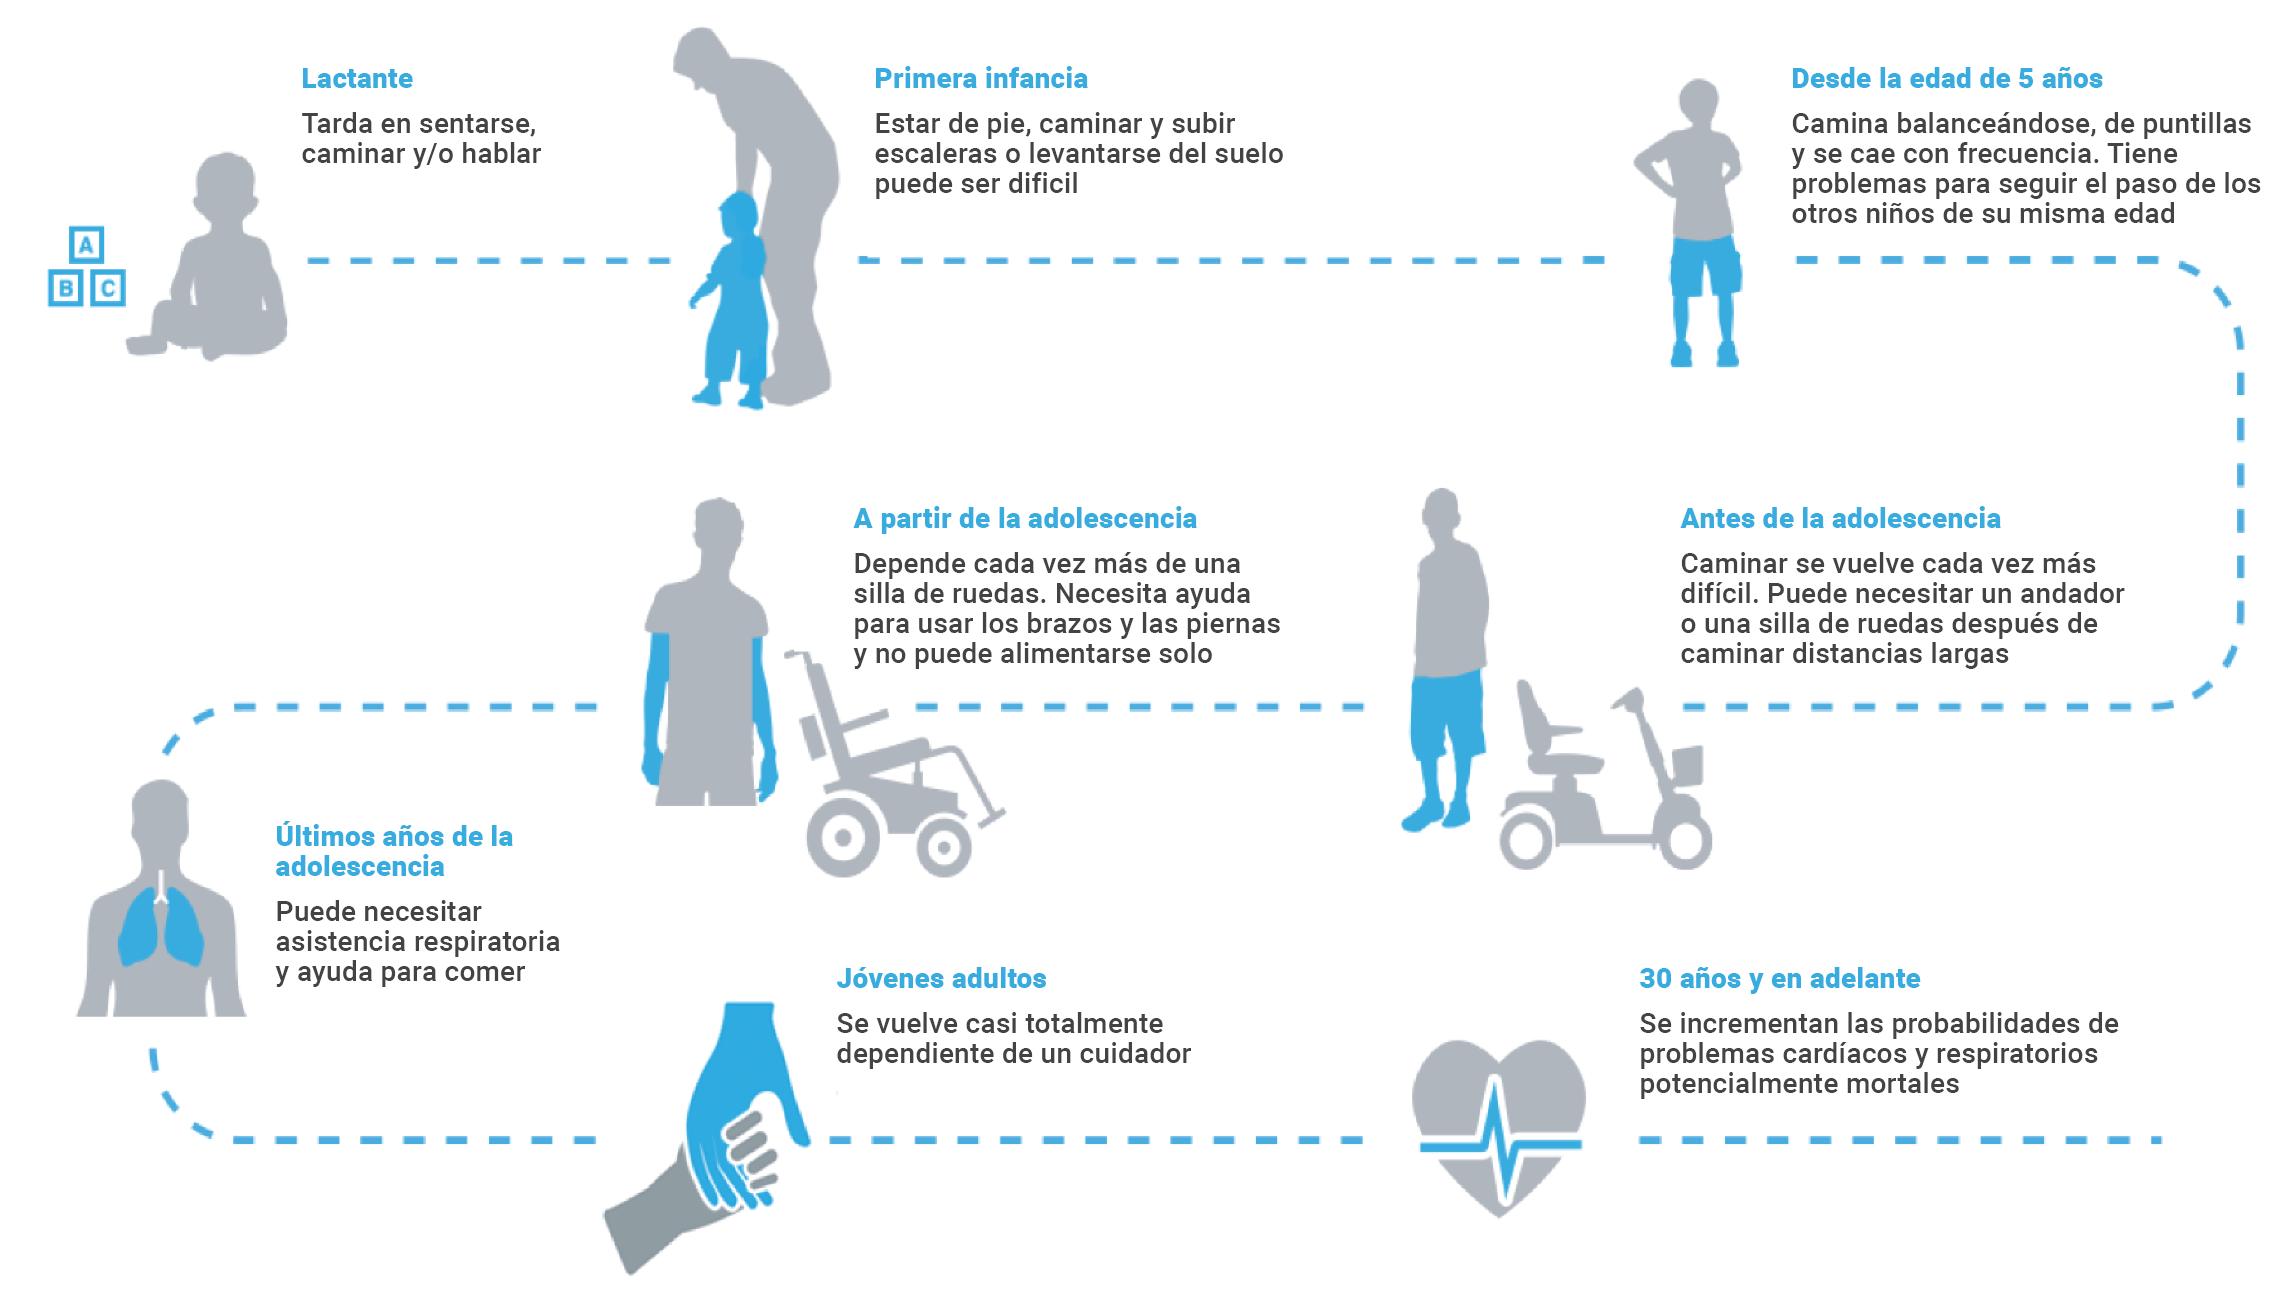 Distrofia muscular Duchenne síntomas